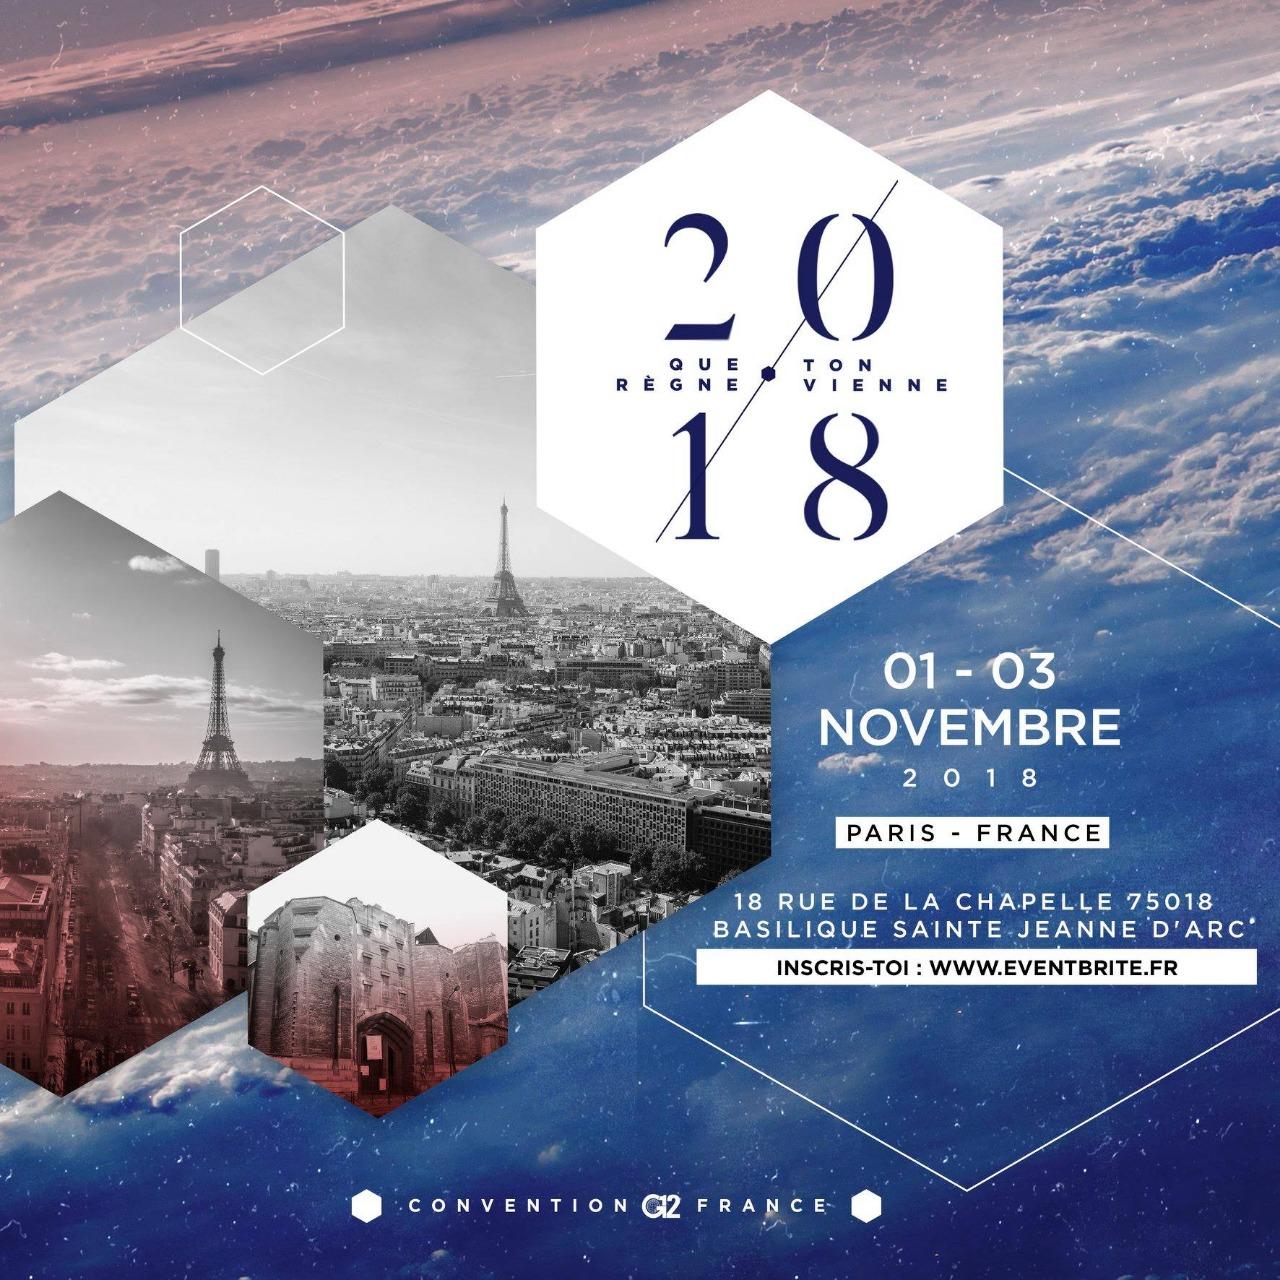 Rencontre nationale d'arboriculture 2018